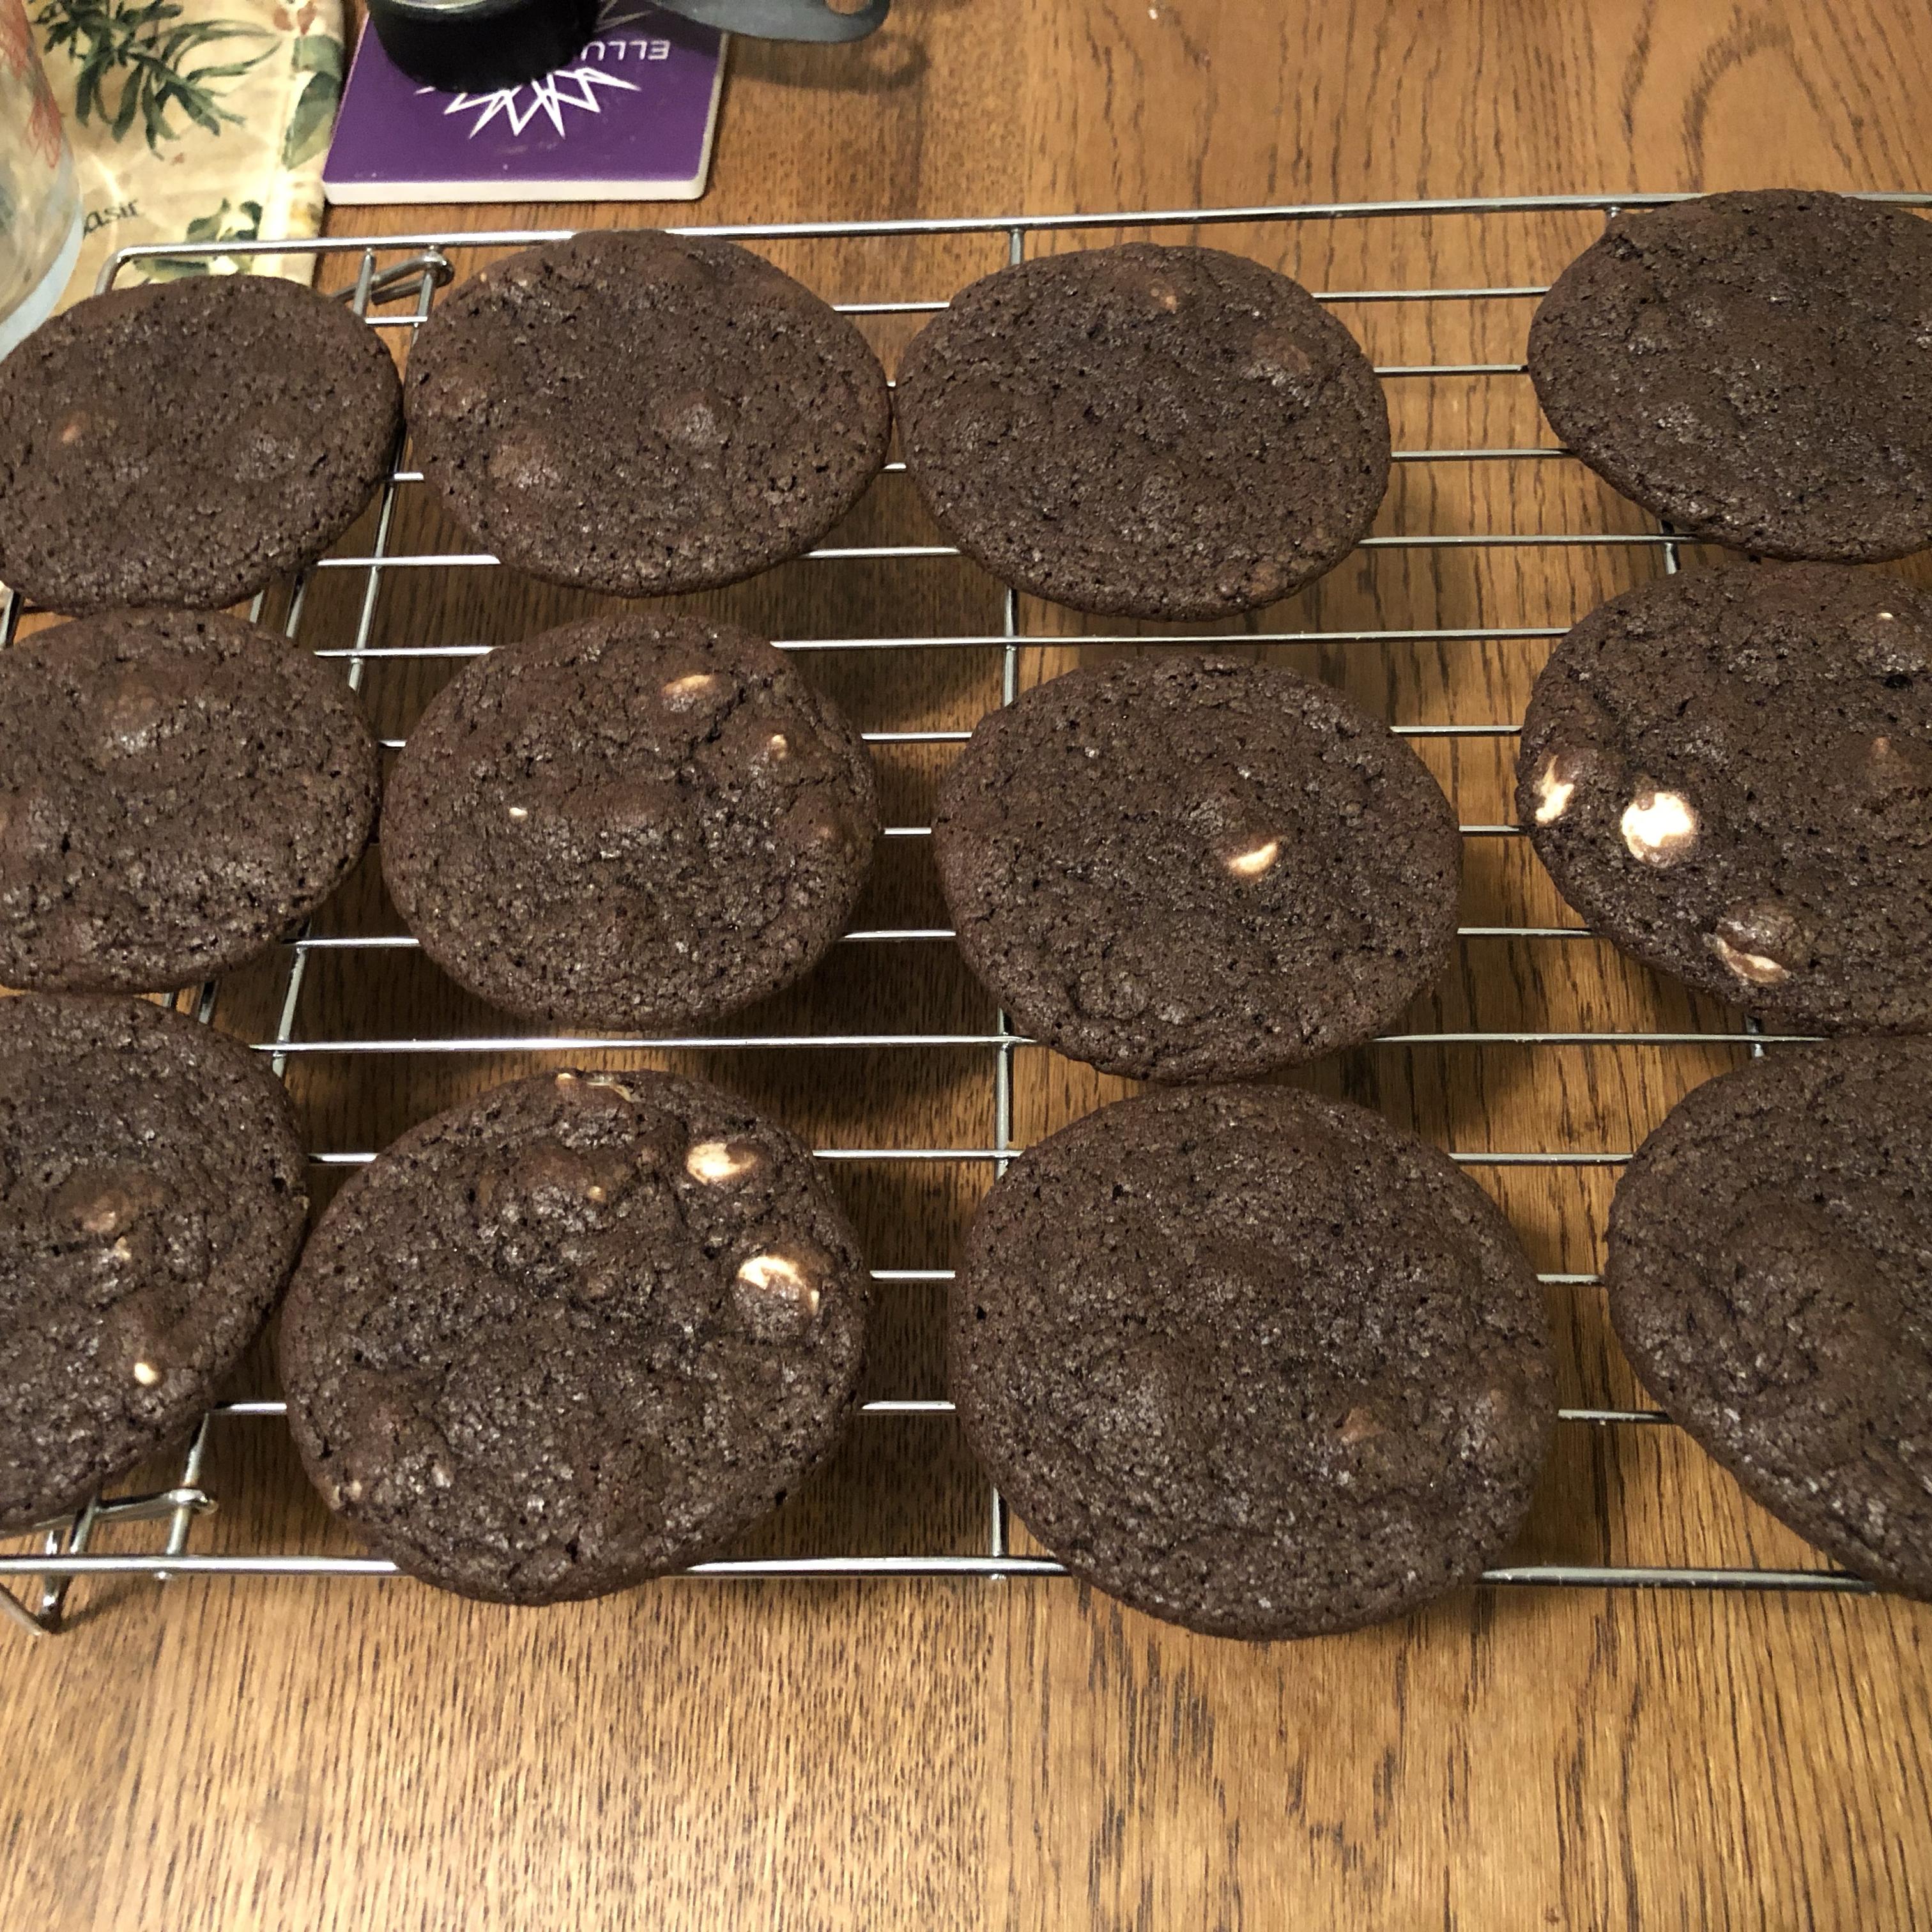 Soft Chocolate Cookies emcque